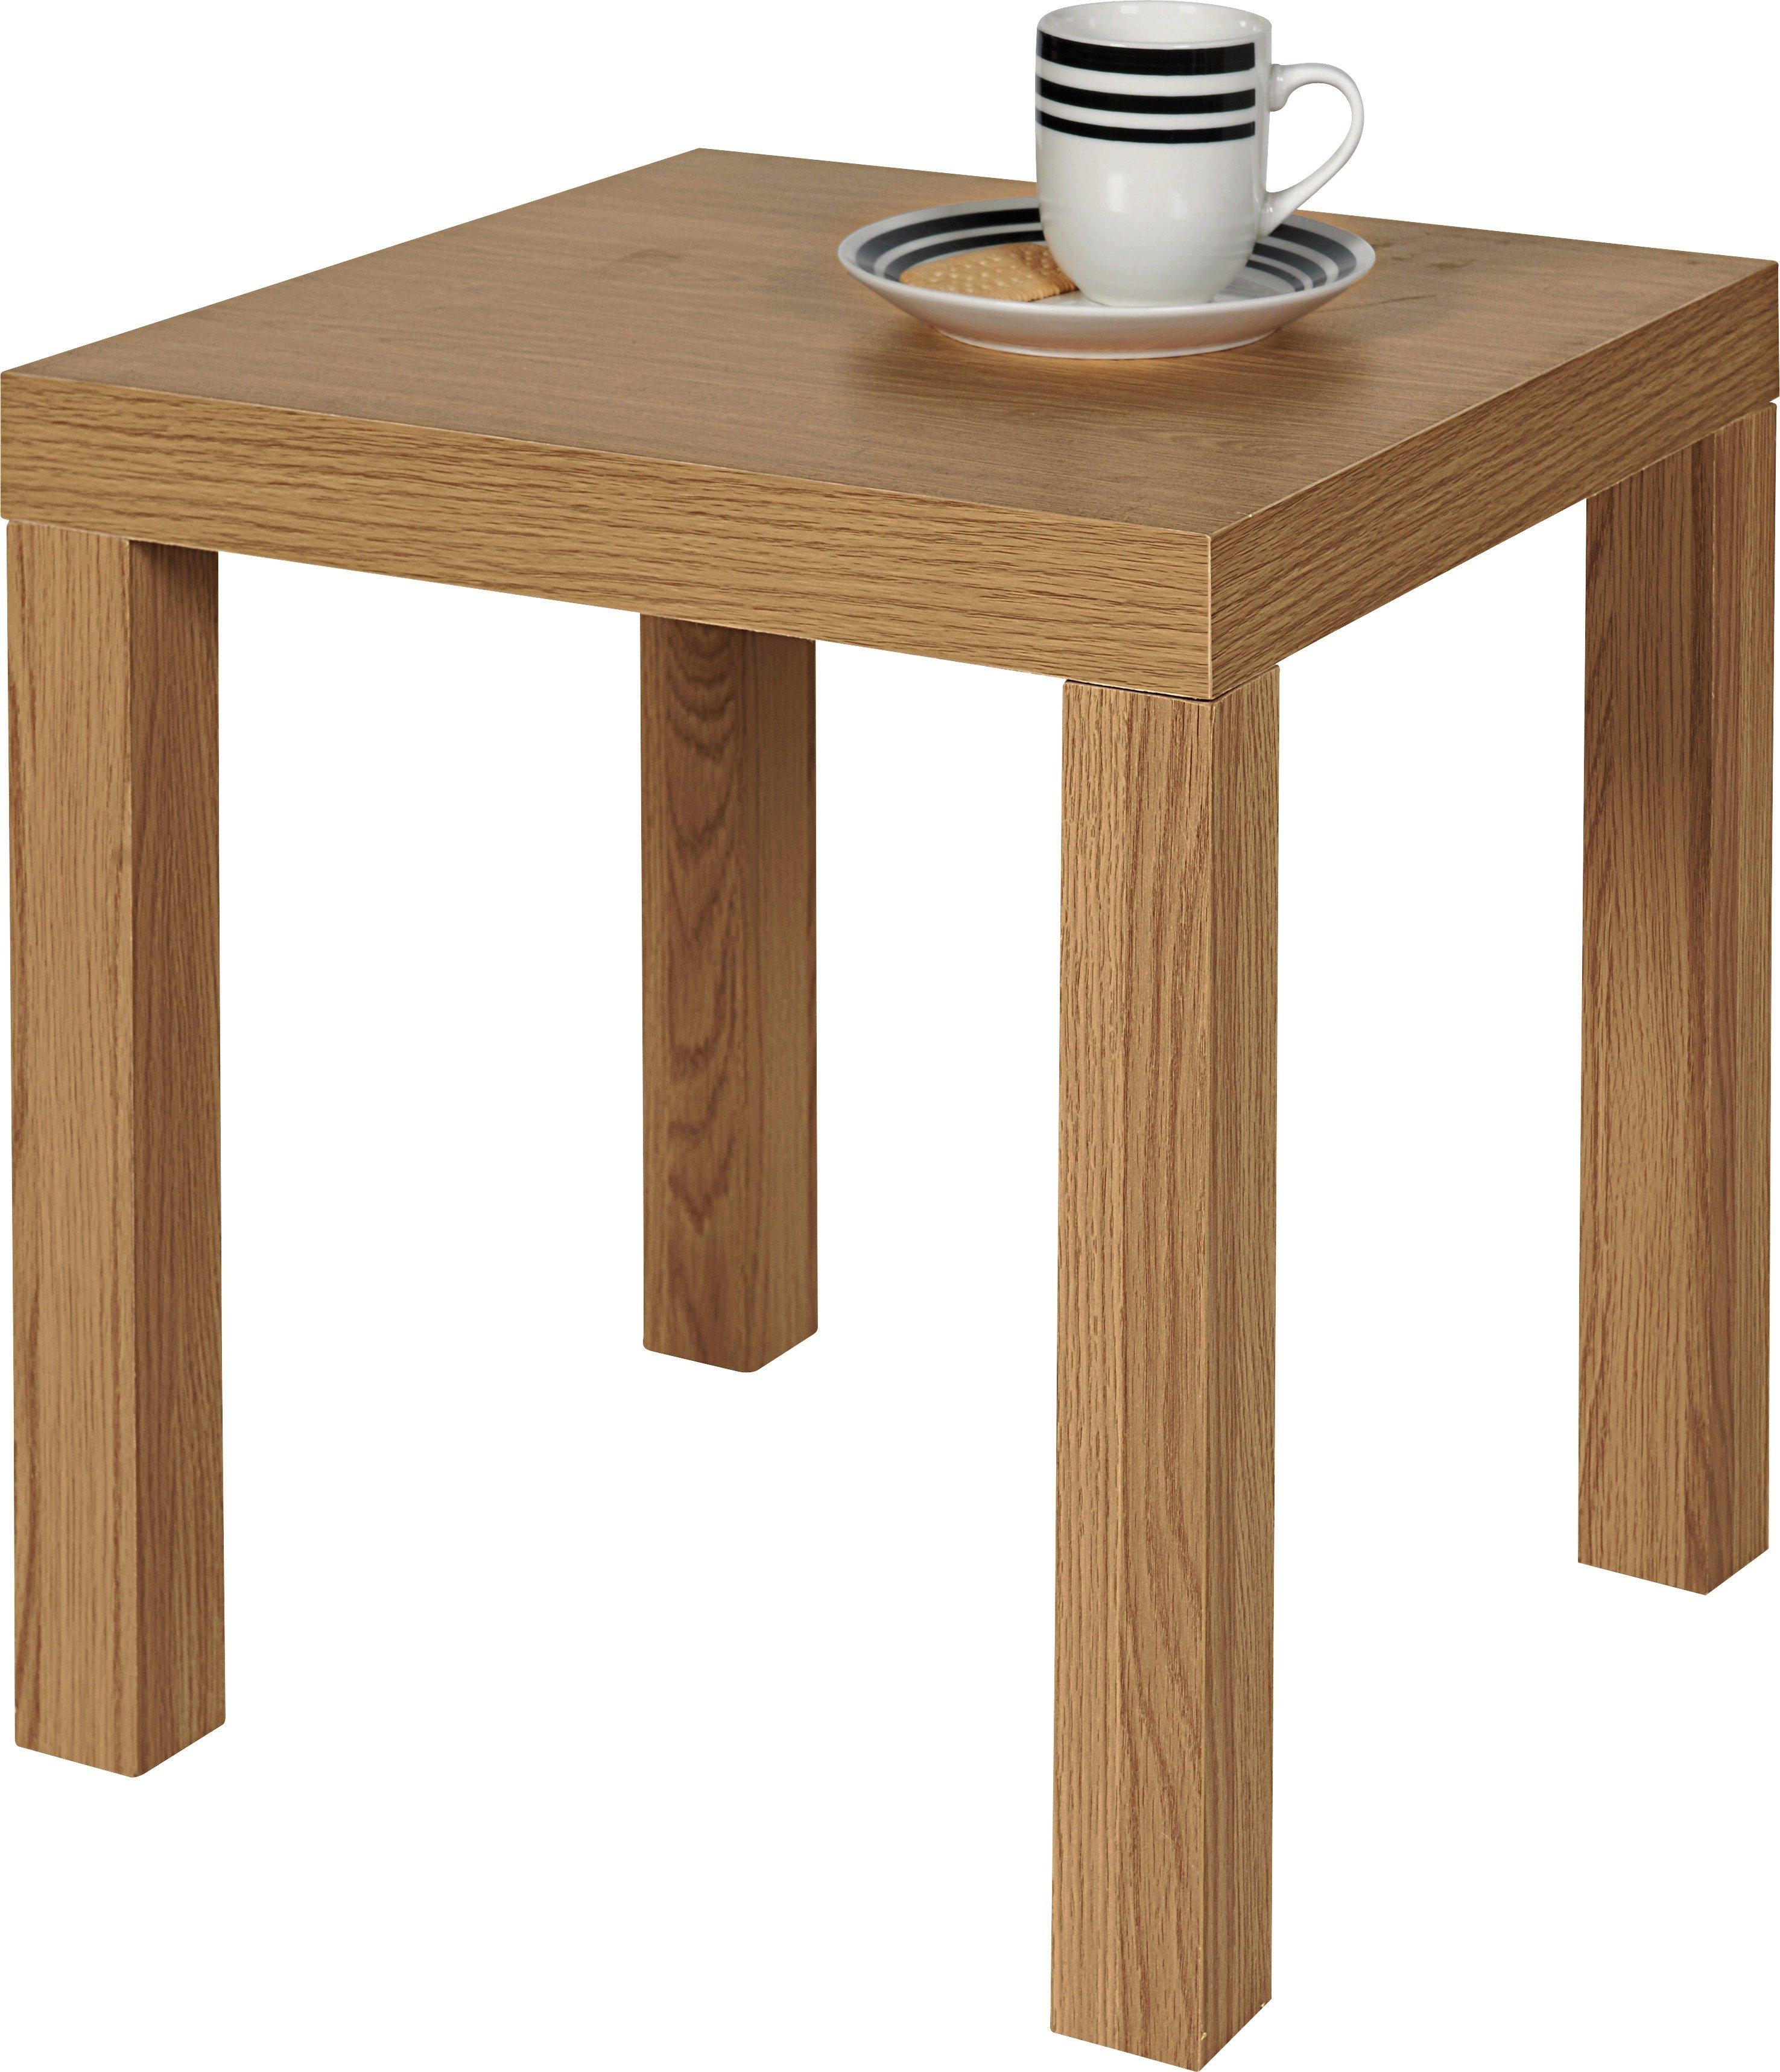 buy home end table - oak effect at argos.co.uk - your online shop